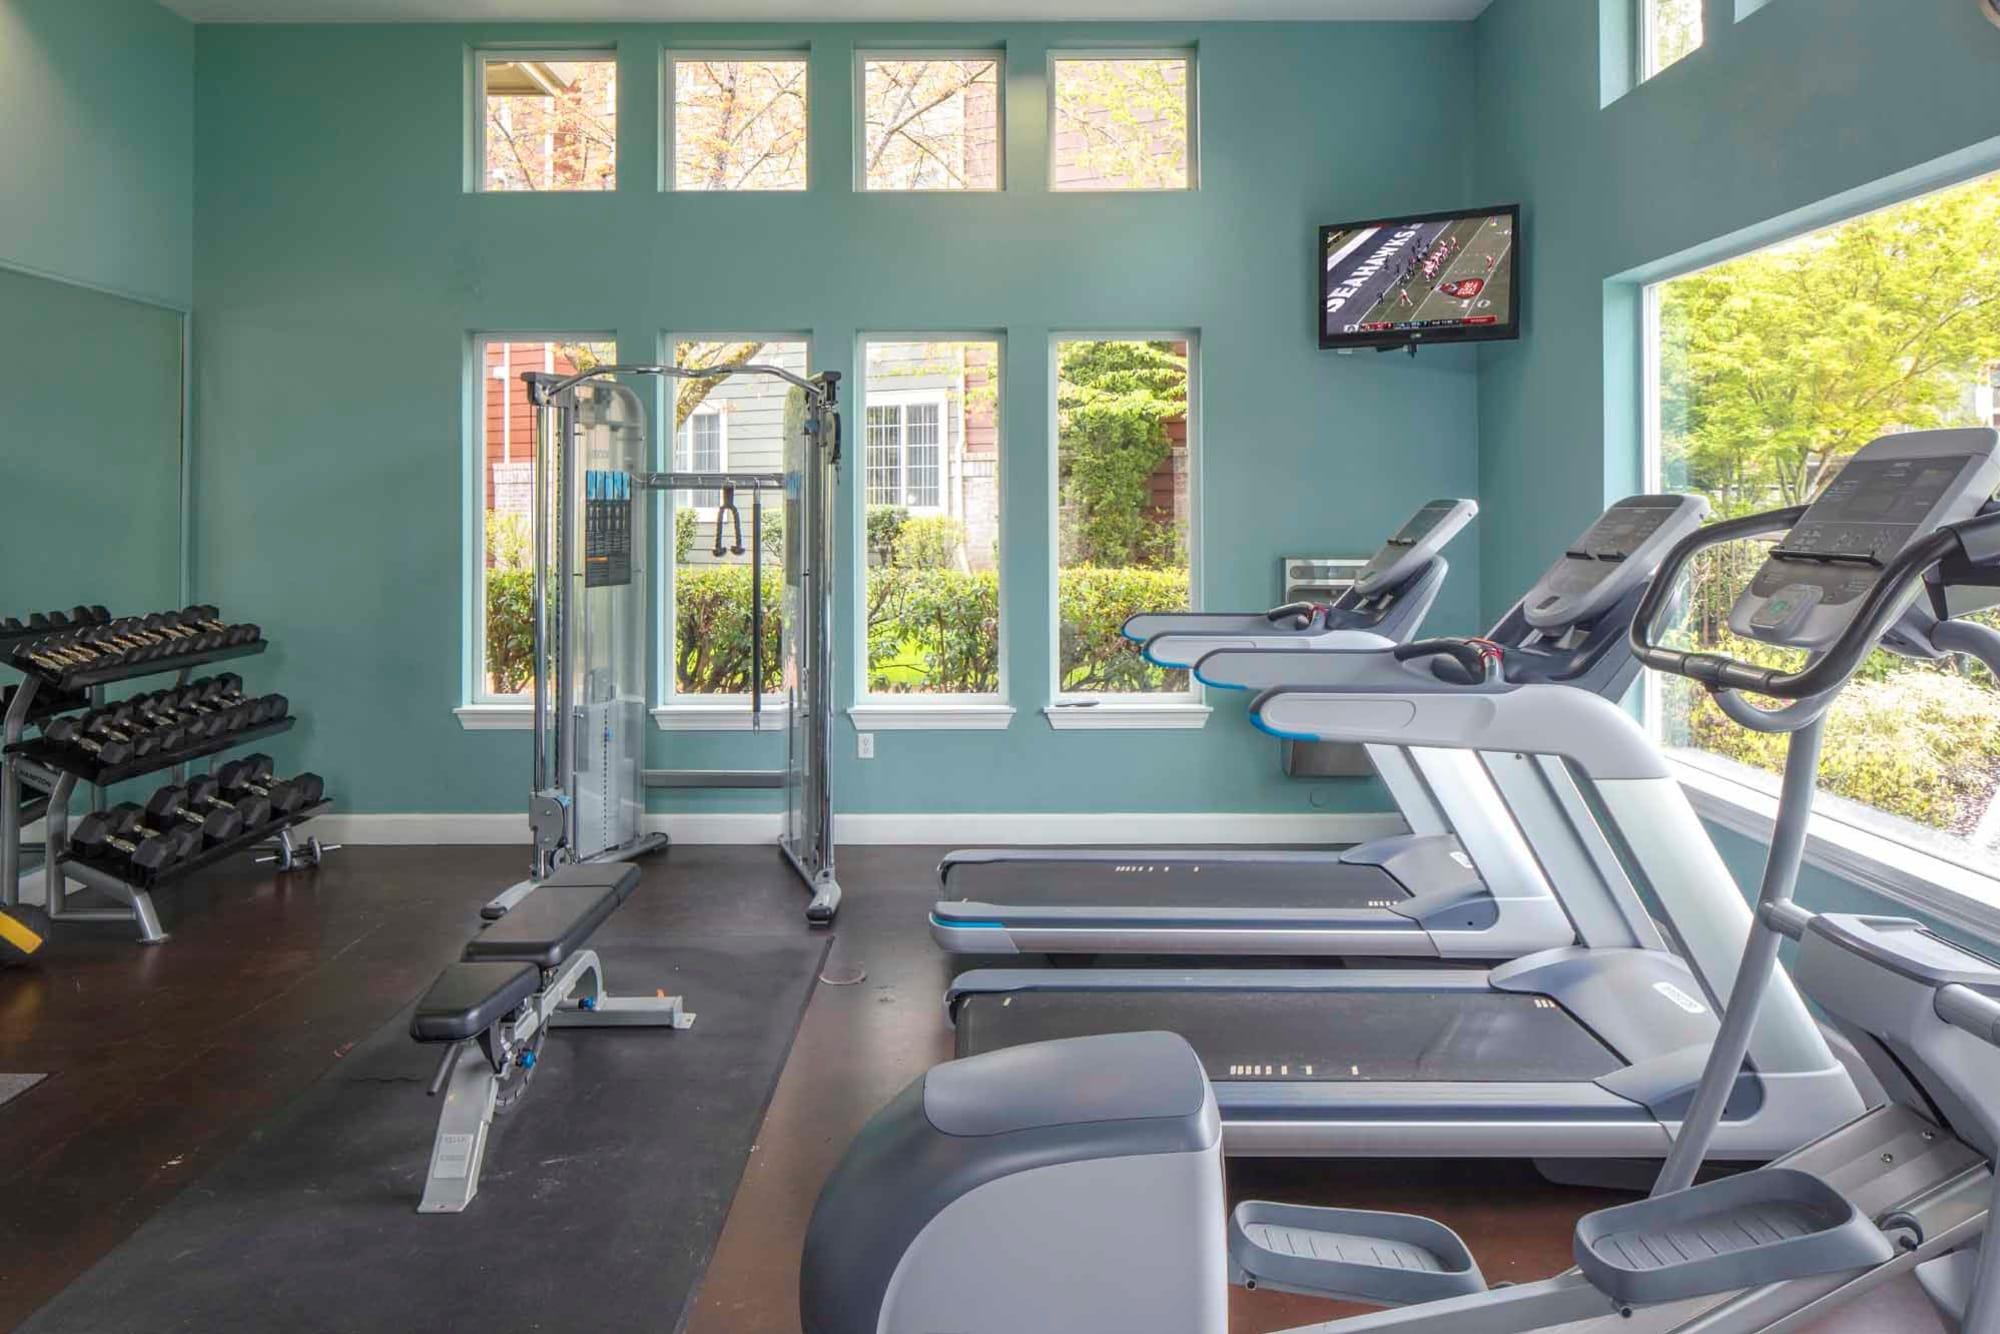 Fitness Center at The Grove at Orenco Station in Hillsboro, Oregon